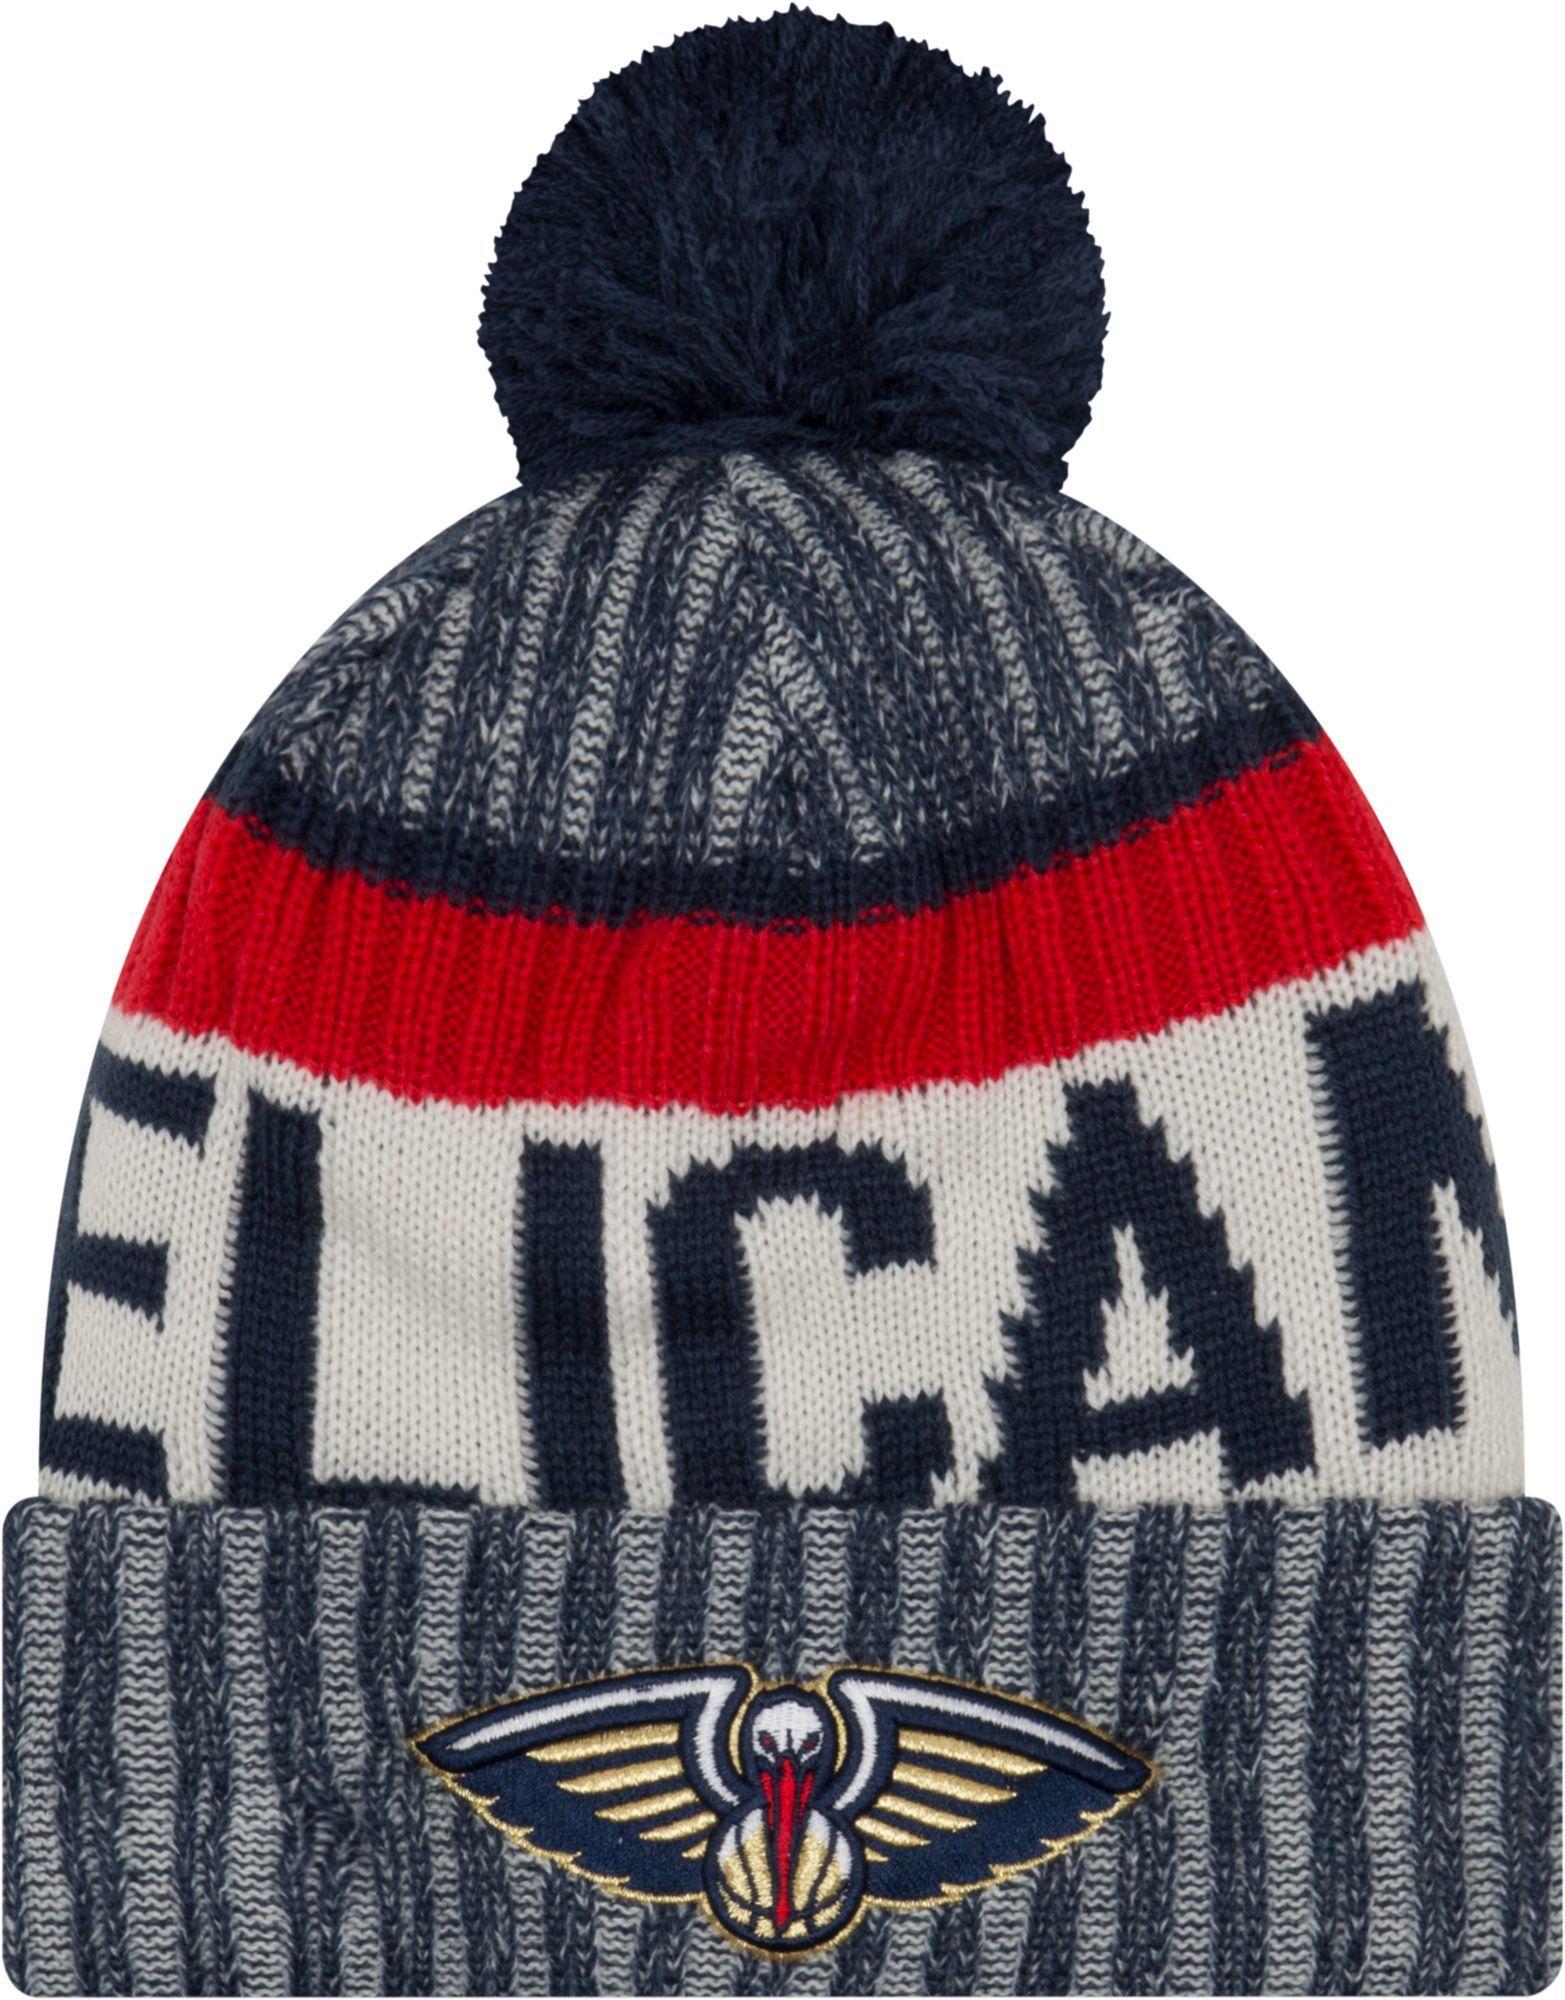 7700a5cdbdd New Era Men s New Orleans Pelicans Knit Hat